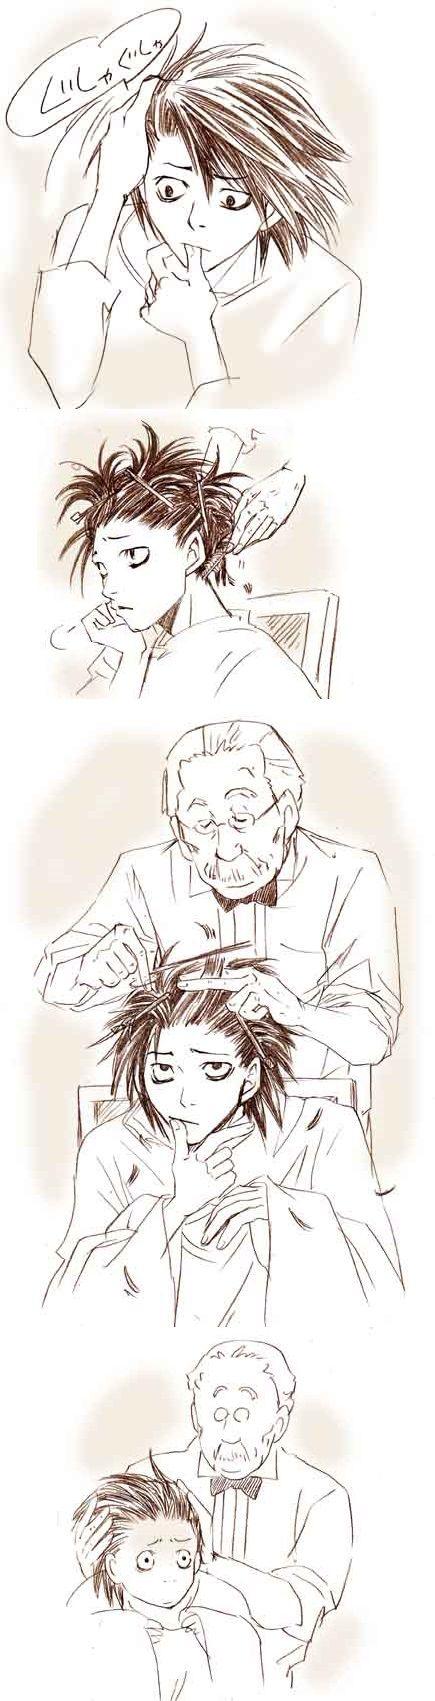 Watari decides to give L a haircut